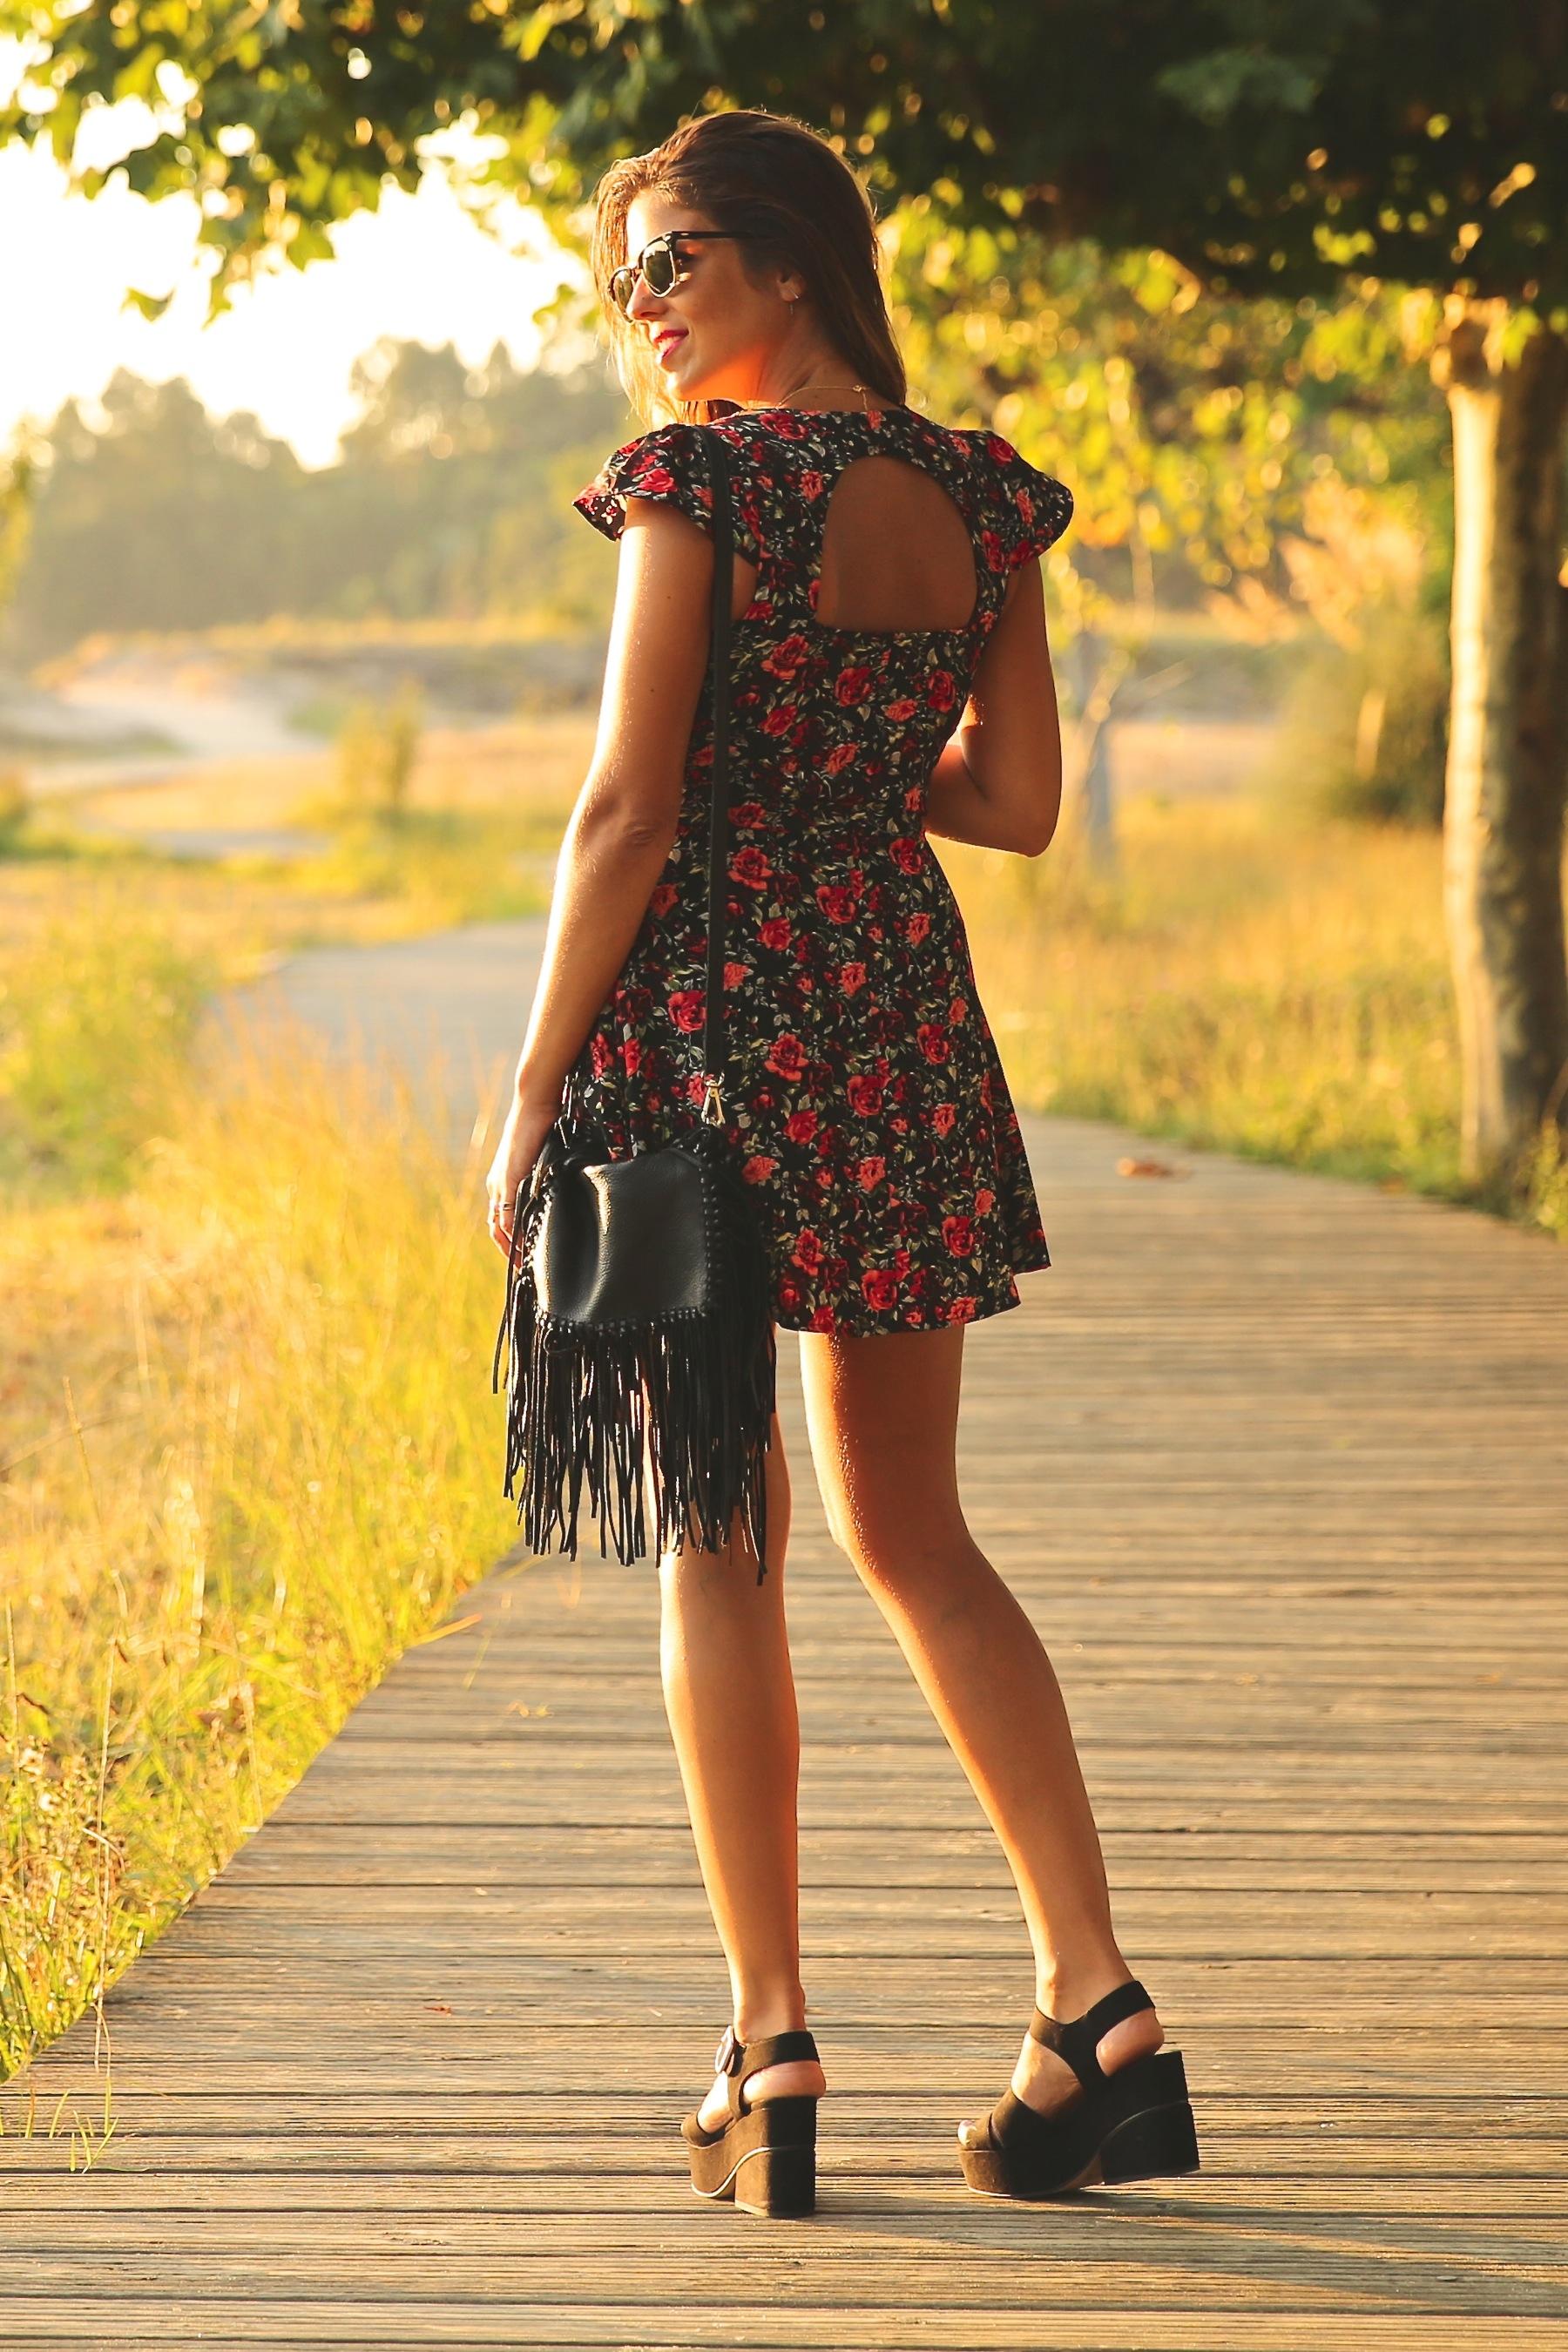 trendy_taste-look-outfit-street_style-ootd-blog-blogger-fashion_spain-moda_españa-flower_print-dress-vestido-flores-sandalias_negras-black_sandals-platforms-sunset-playa-beach-summer-10